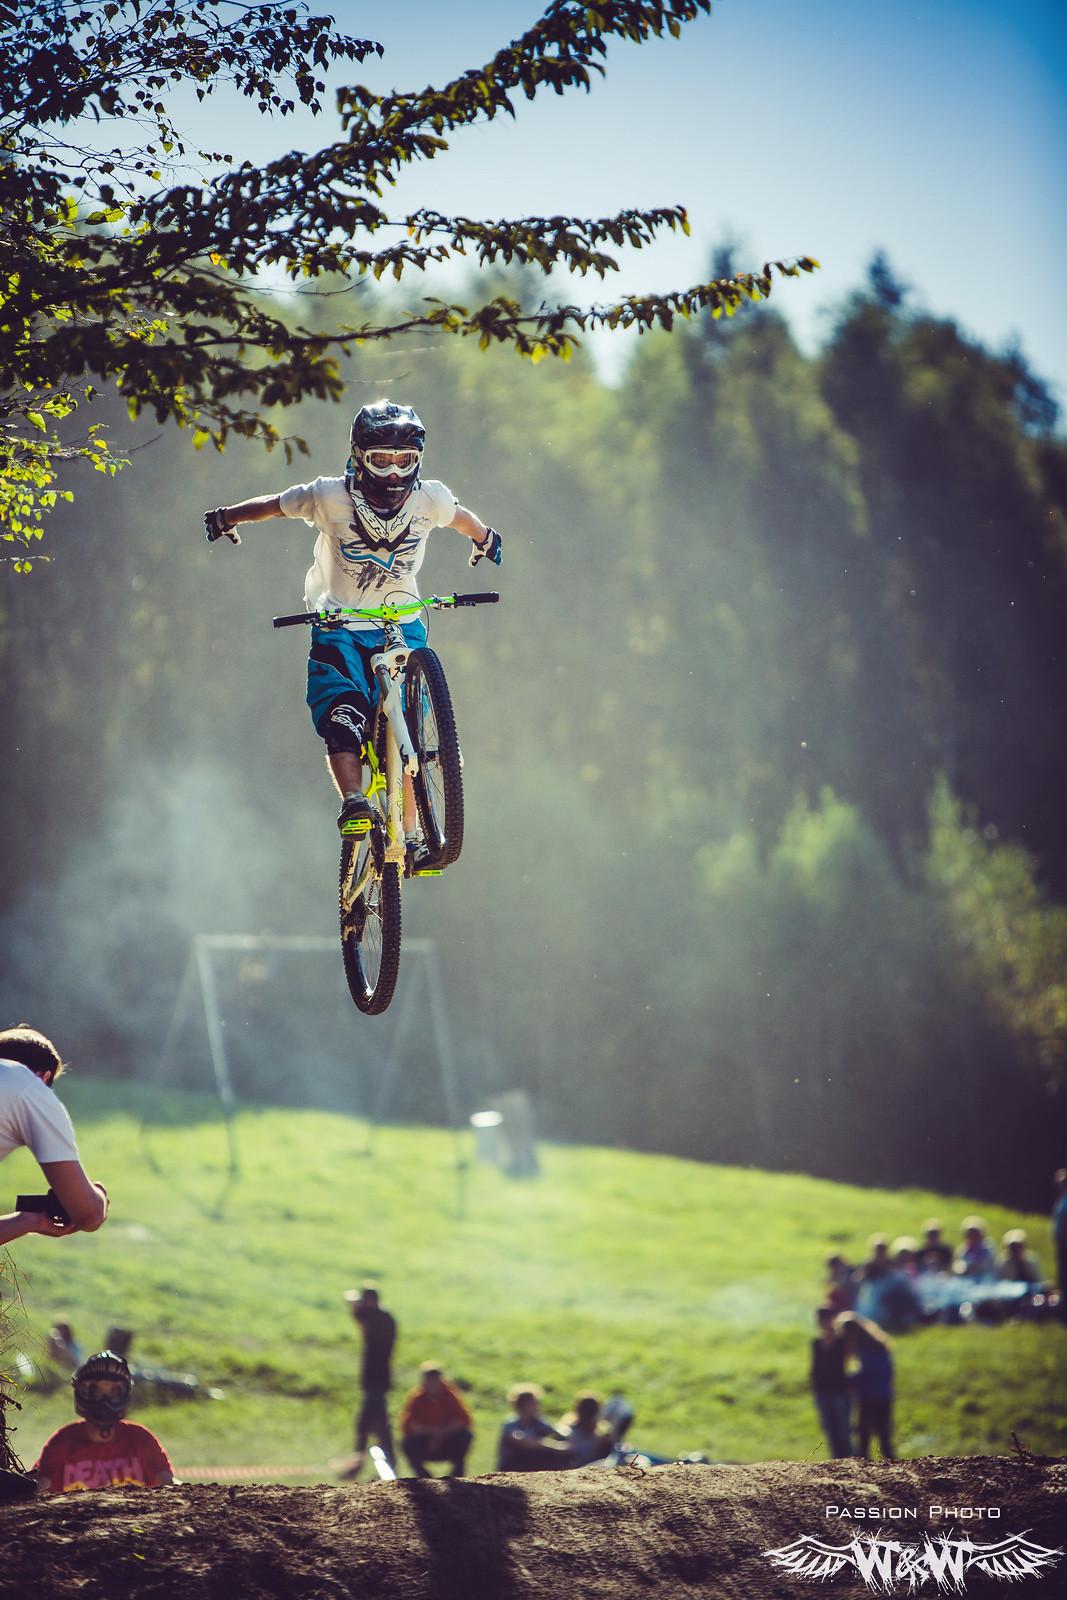 Nohand - JawsMtb - Mountain Biking Pictures - Vital MTB